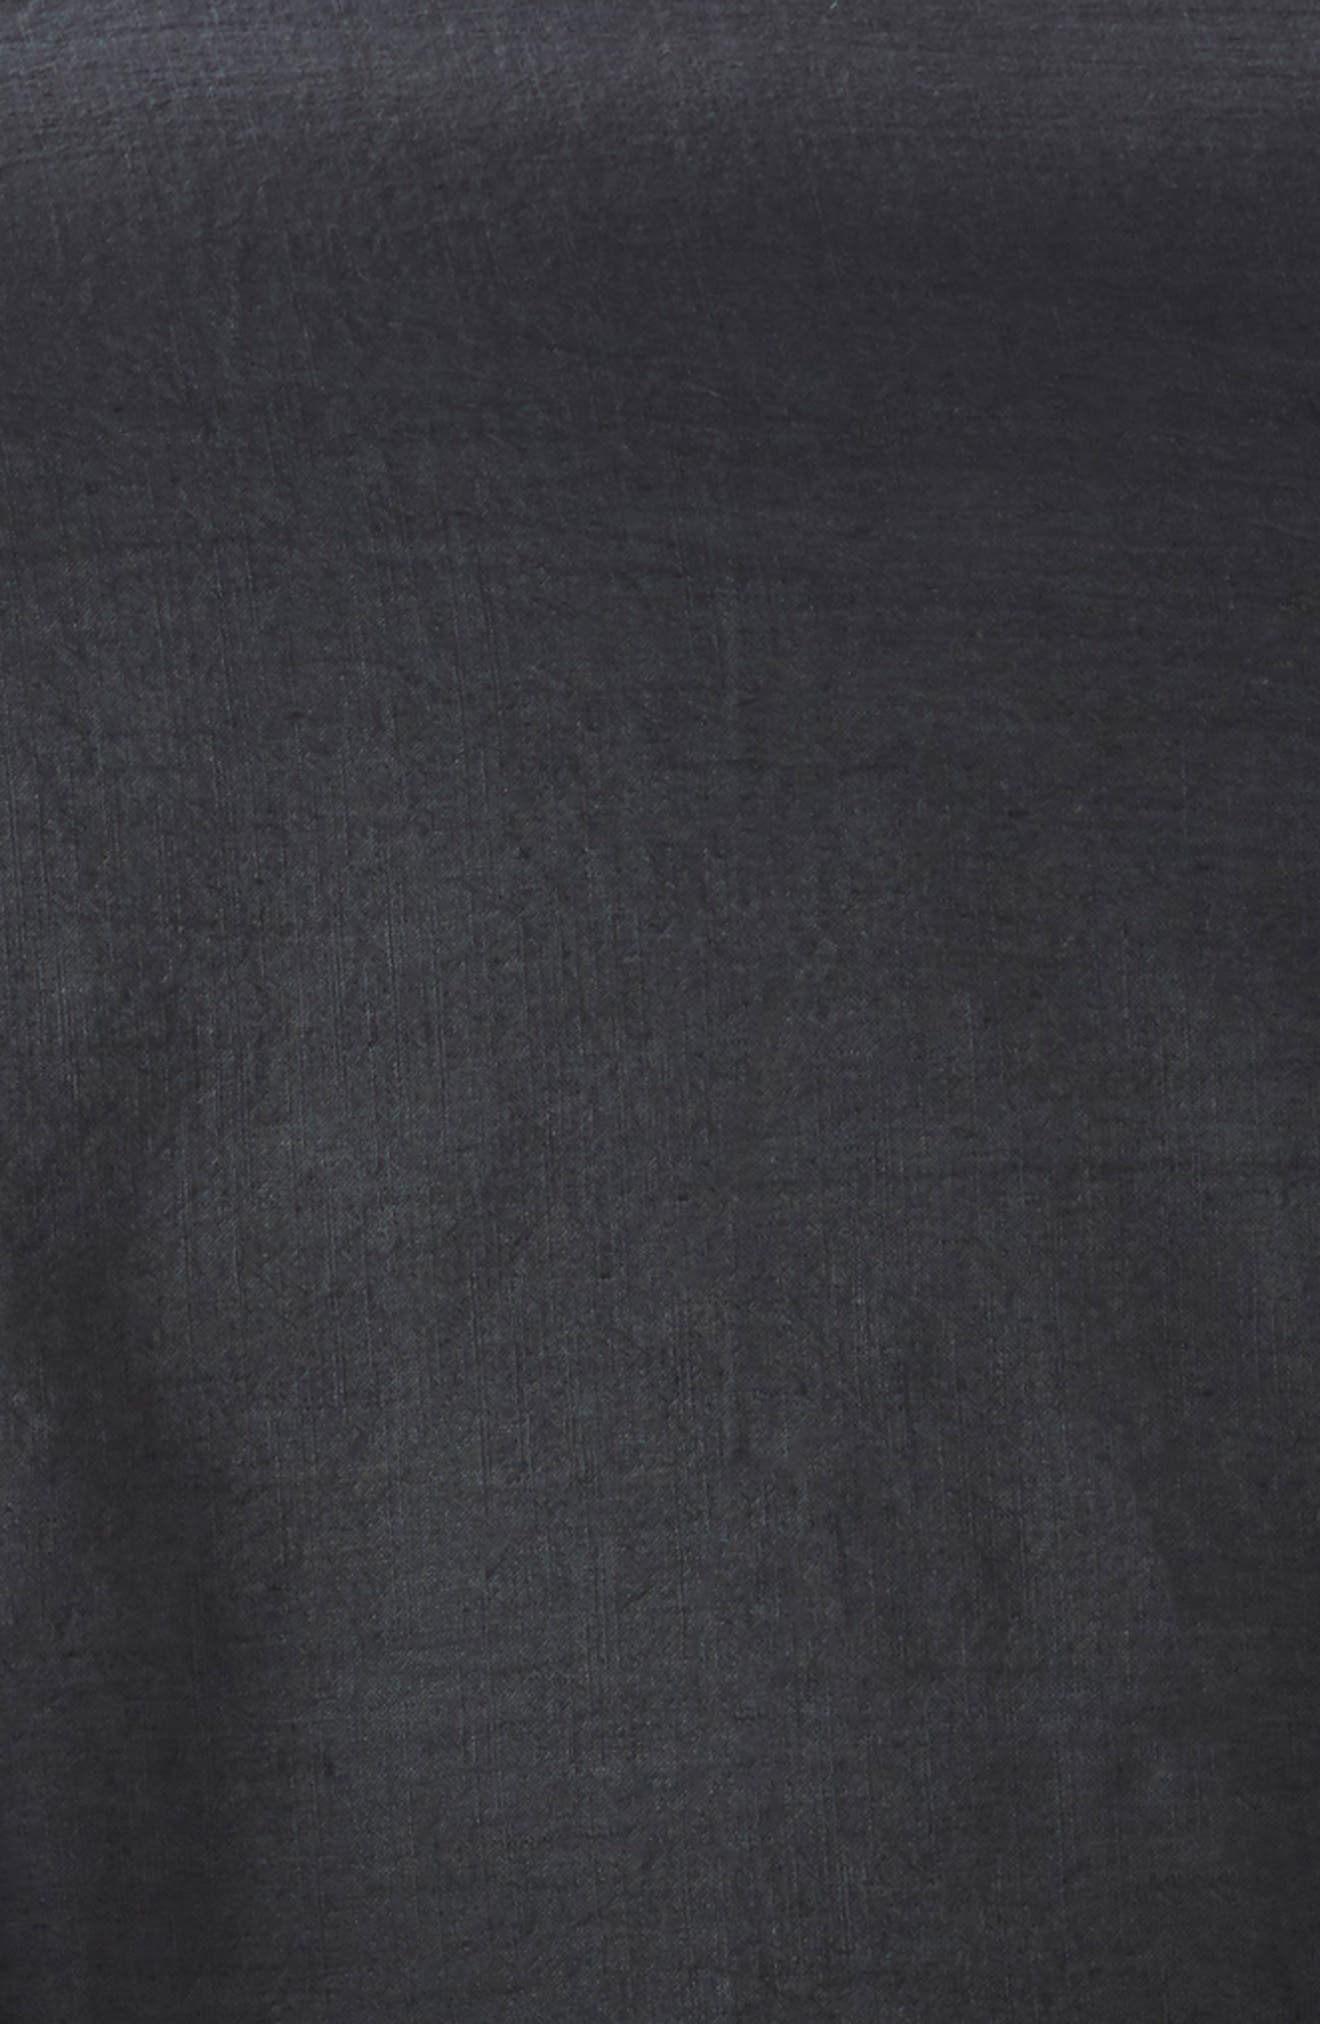 Relaxed Cotton & Linen Duvet Cover,                             Alternate thumbnail 2, color,                             GREY ONYX